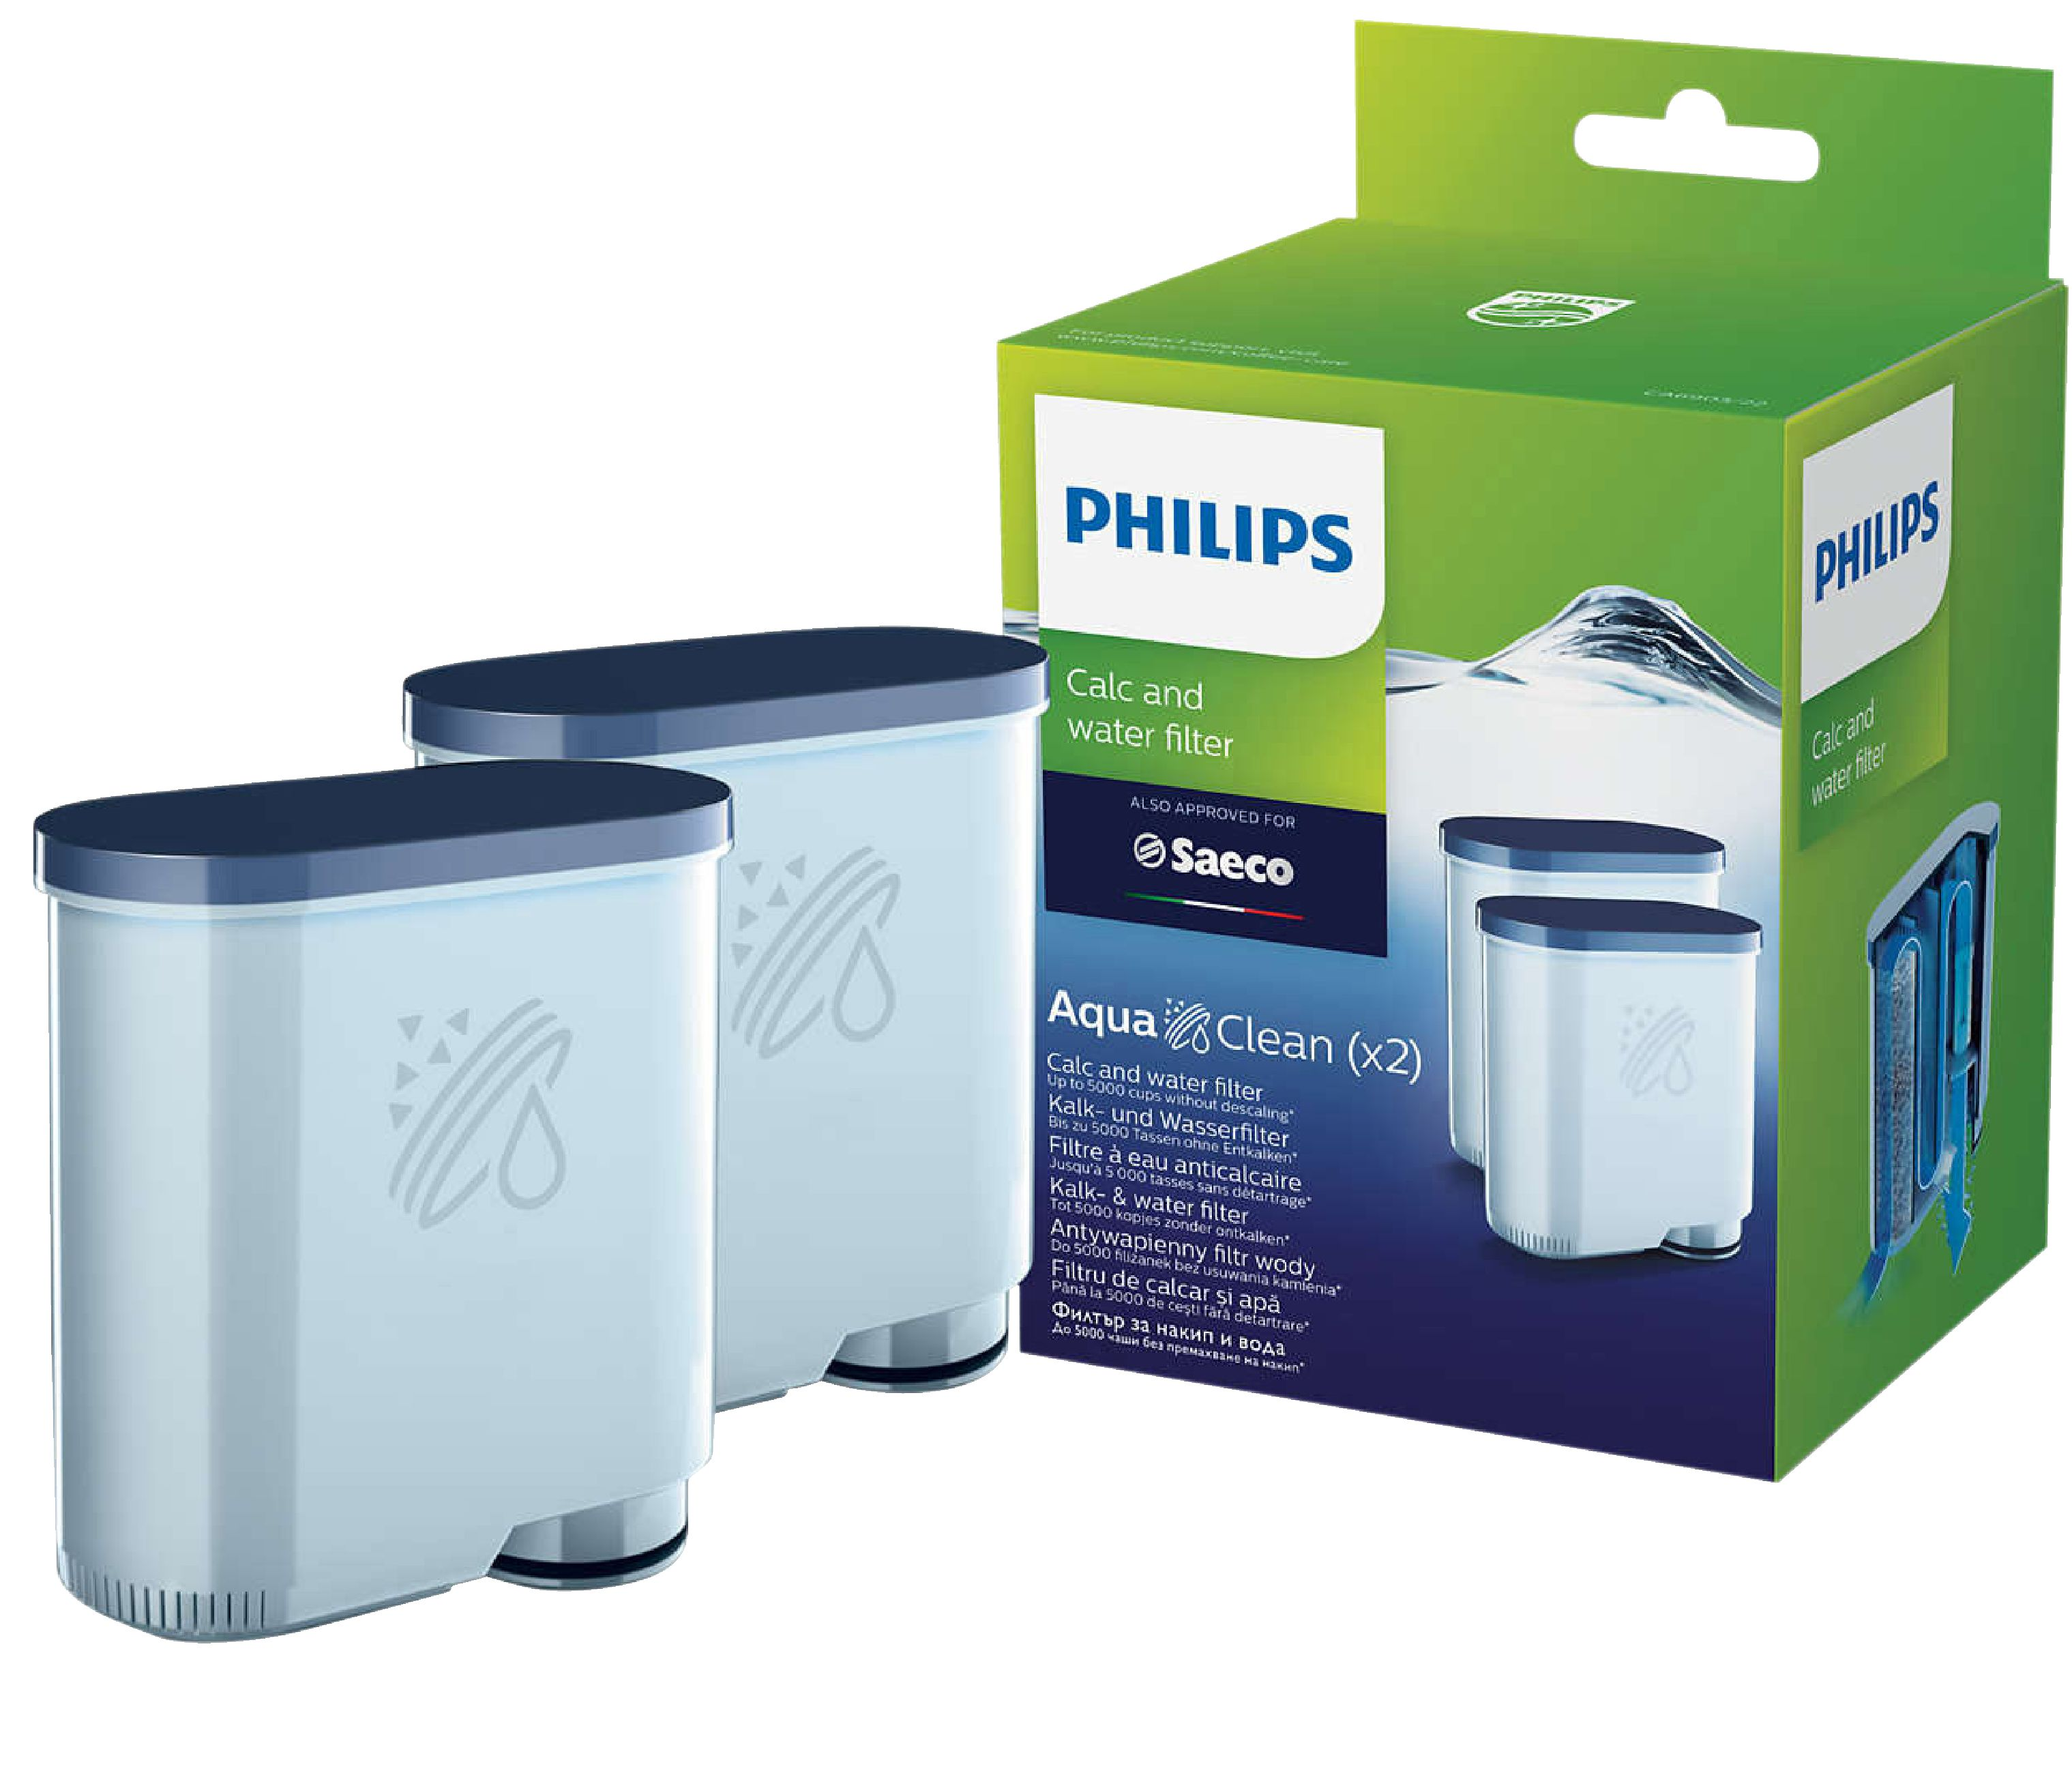 Vodní filtr Philips pro Saeco Espresso CA6903/10 AquaClean 2ks